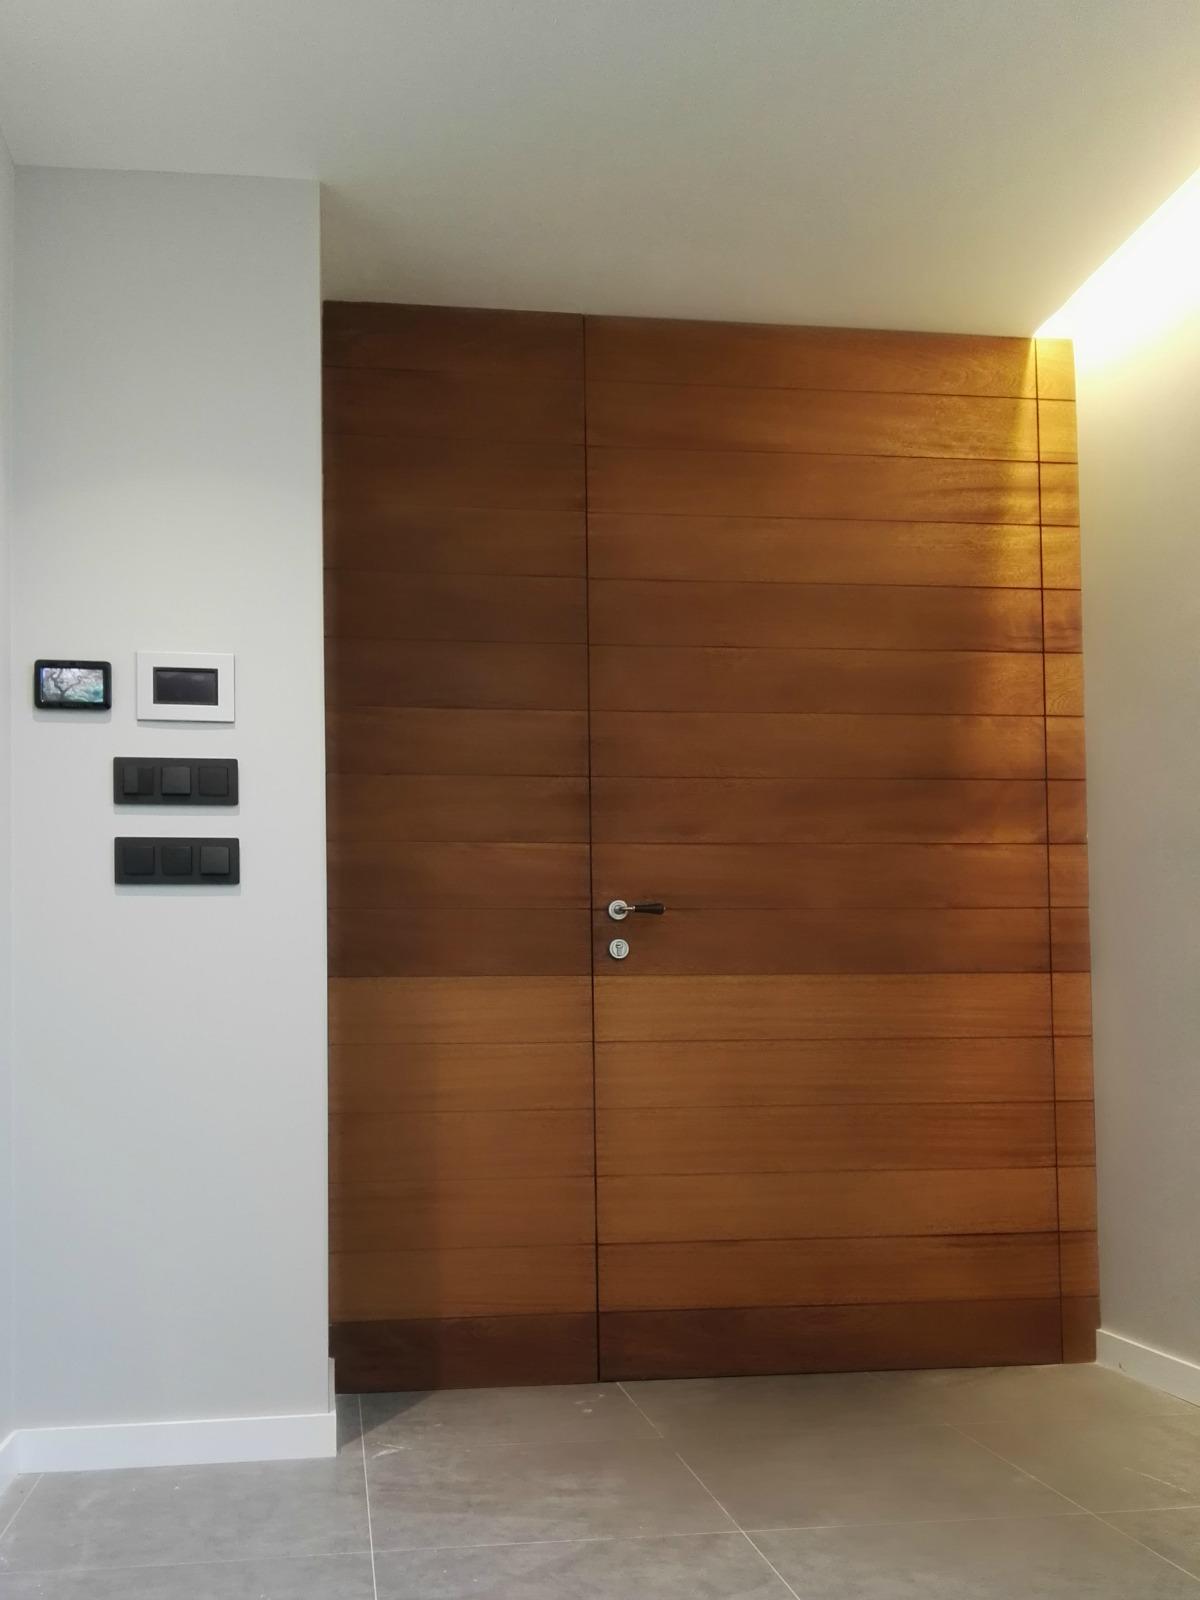 Puerta de entrada en madera puertas coru a vetta grupo - Puertas de entrada de diseno ...